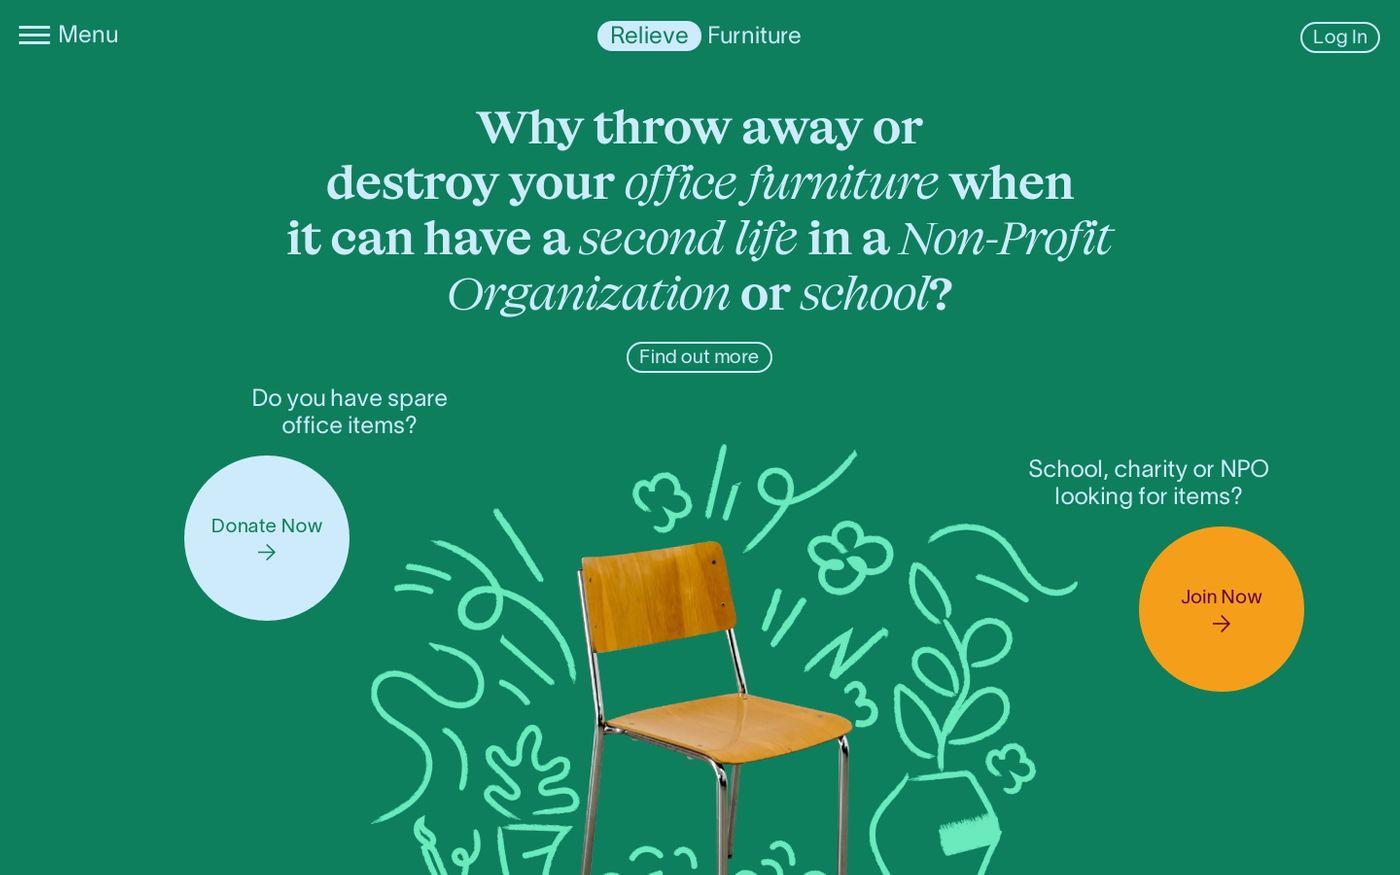 Screenshot of Relieve furniture website